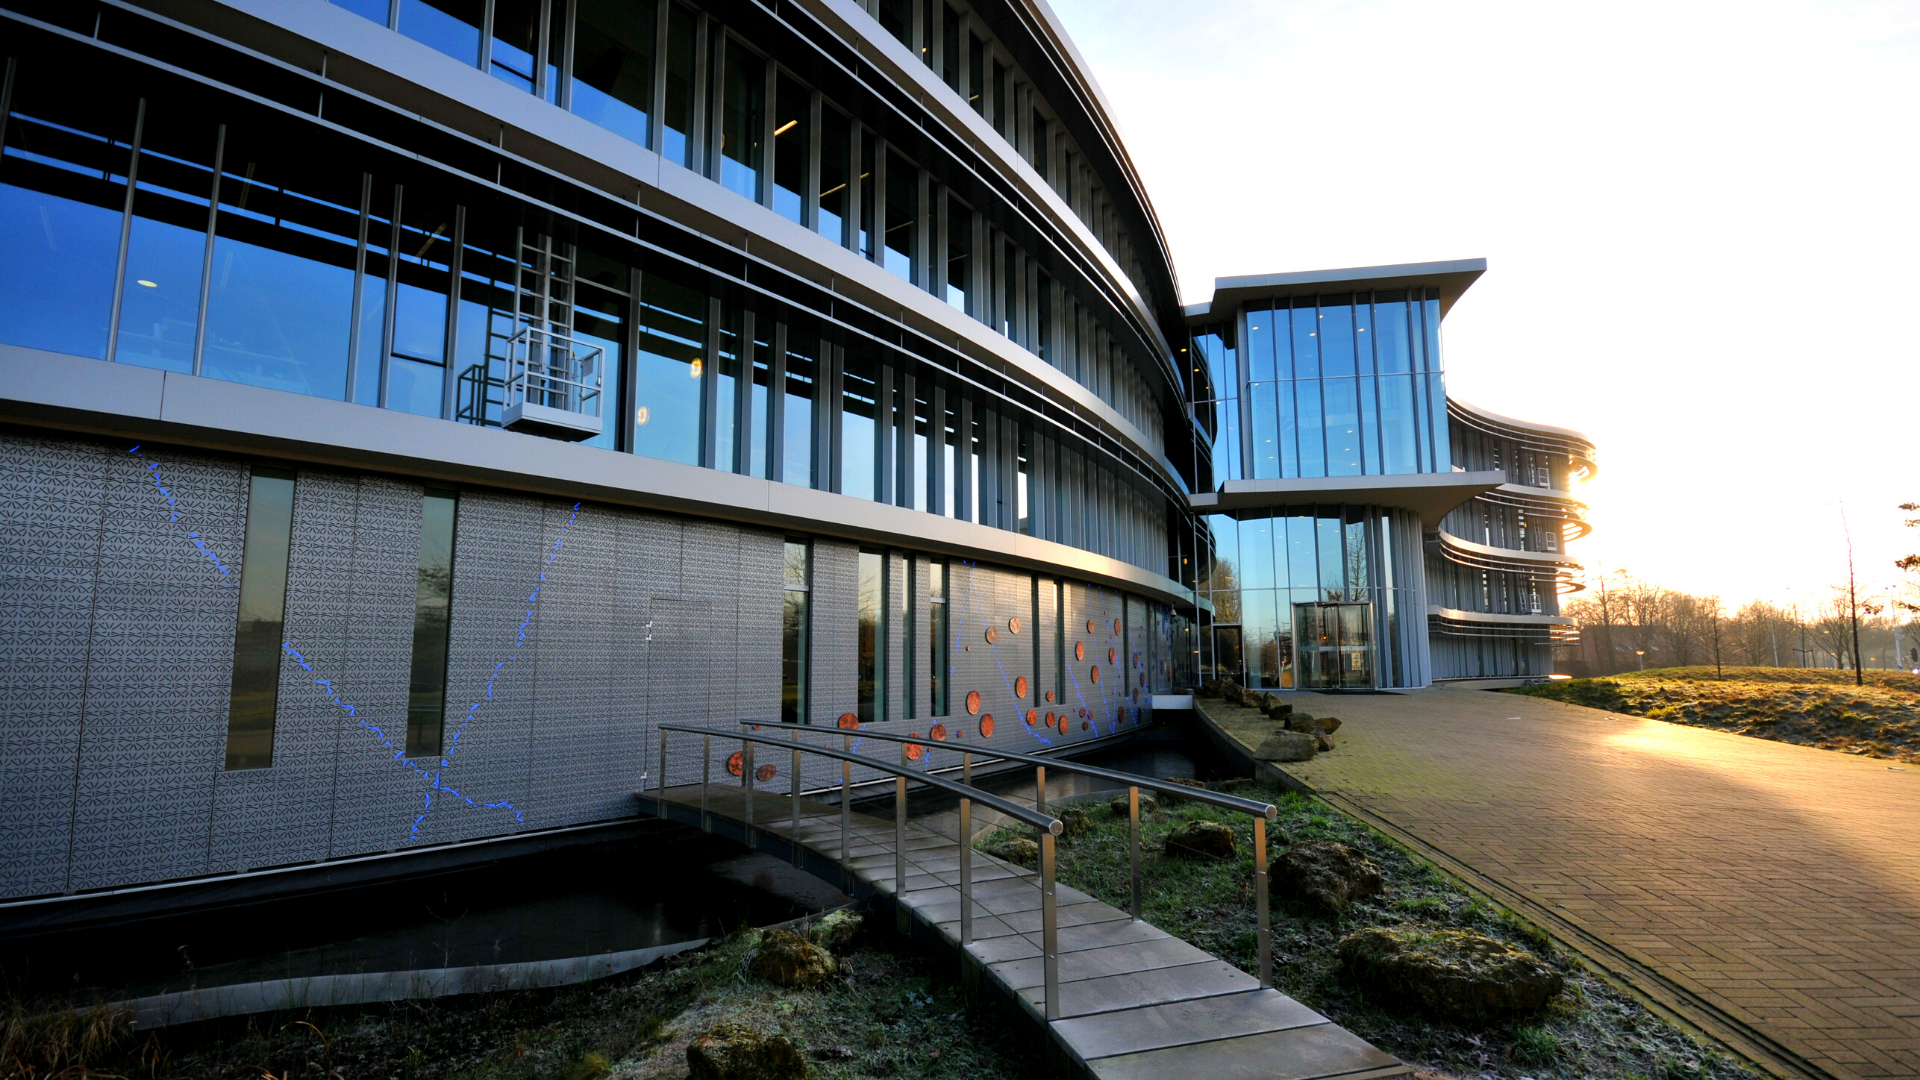 Waterschap-Doetinchem-gevel-perforation-panel-facade-by-night